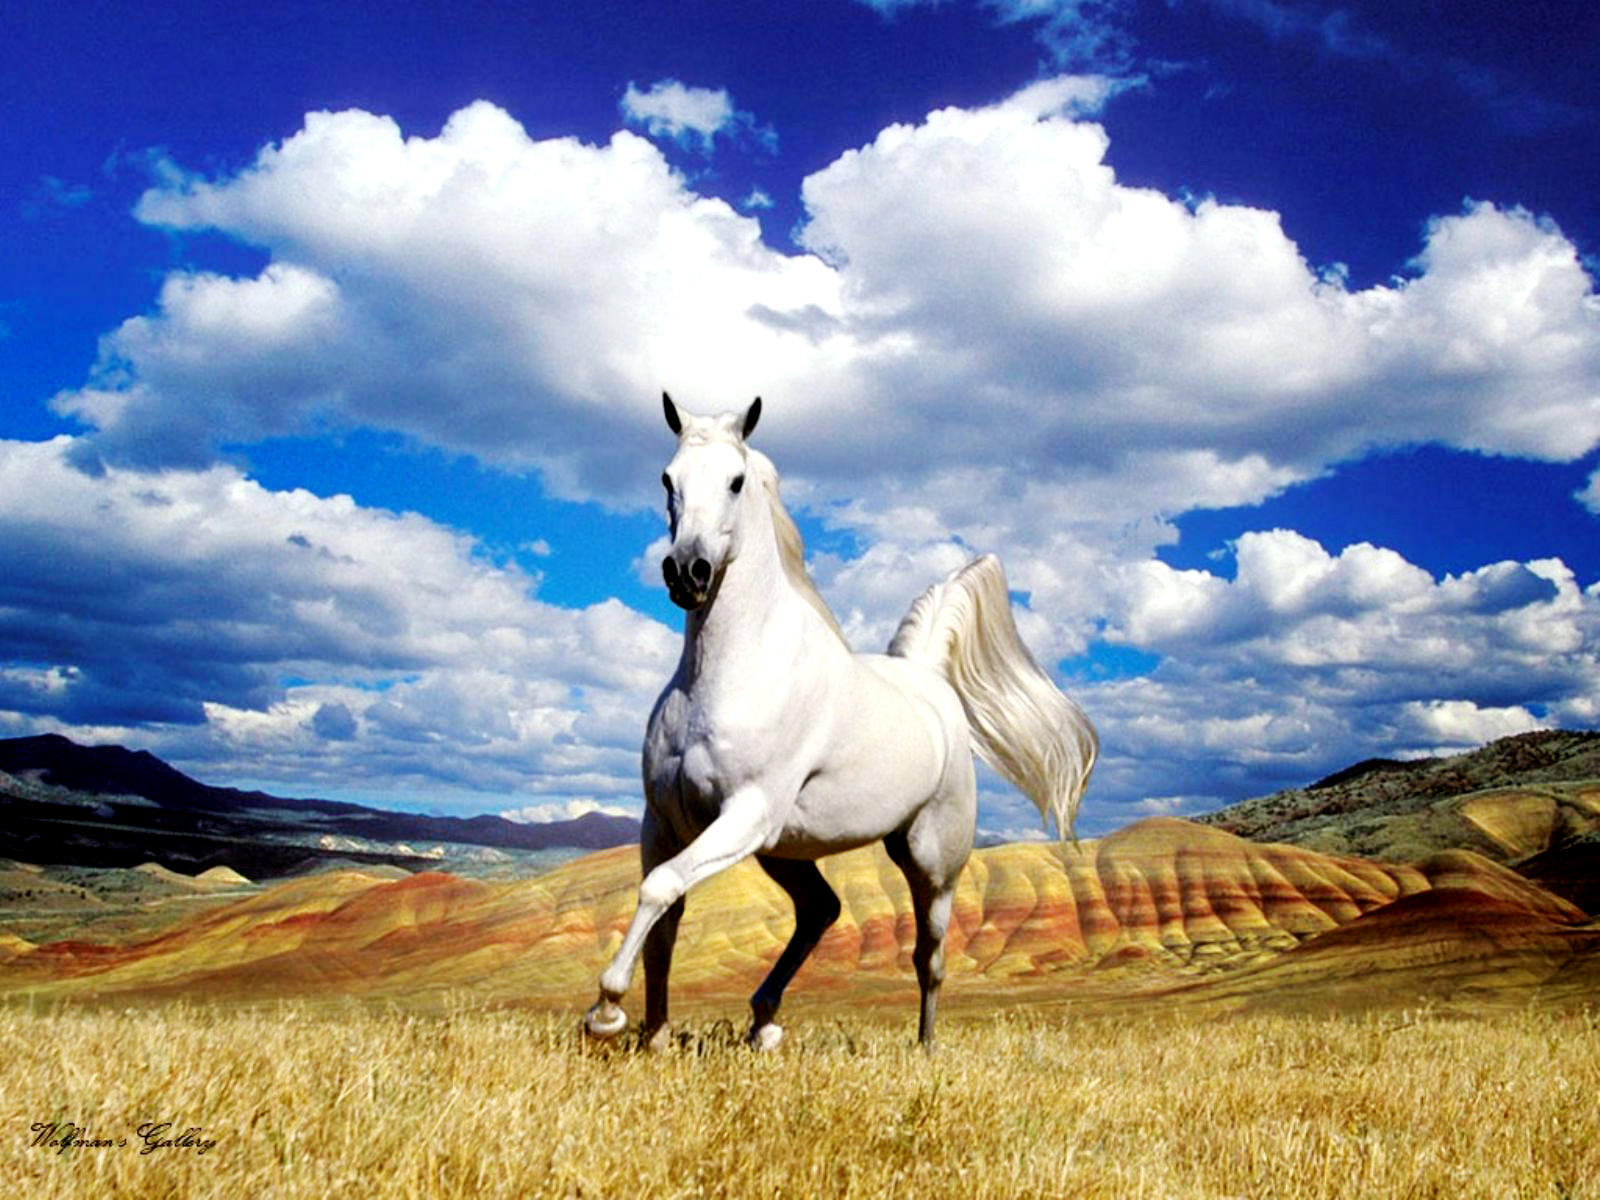 Beautiful Horse Wallpaper 1600x1200 Wallpaper Teahub Io